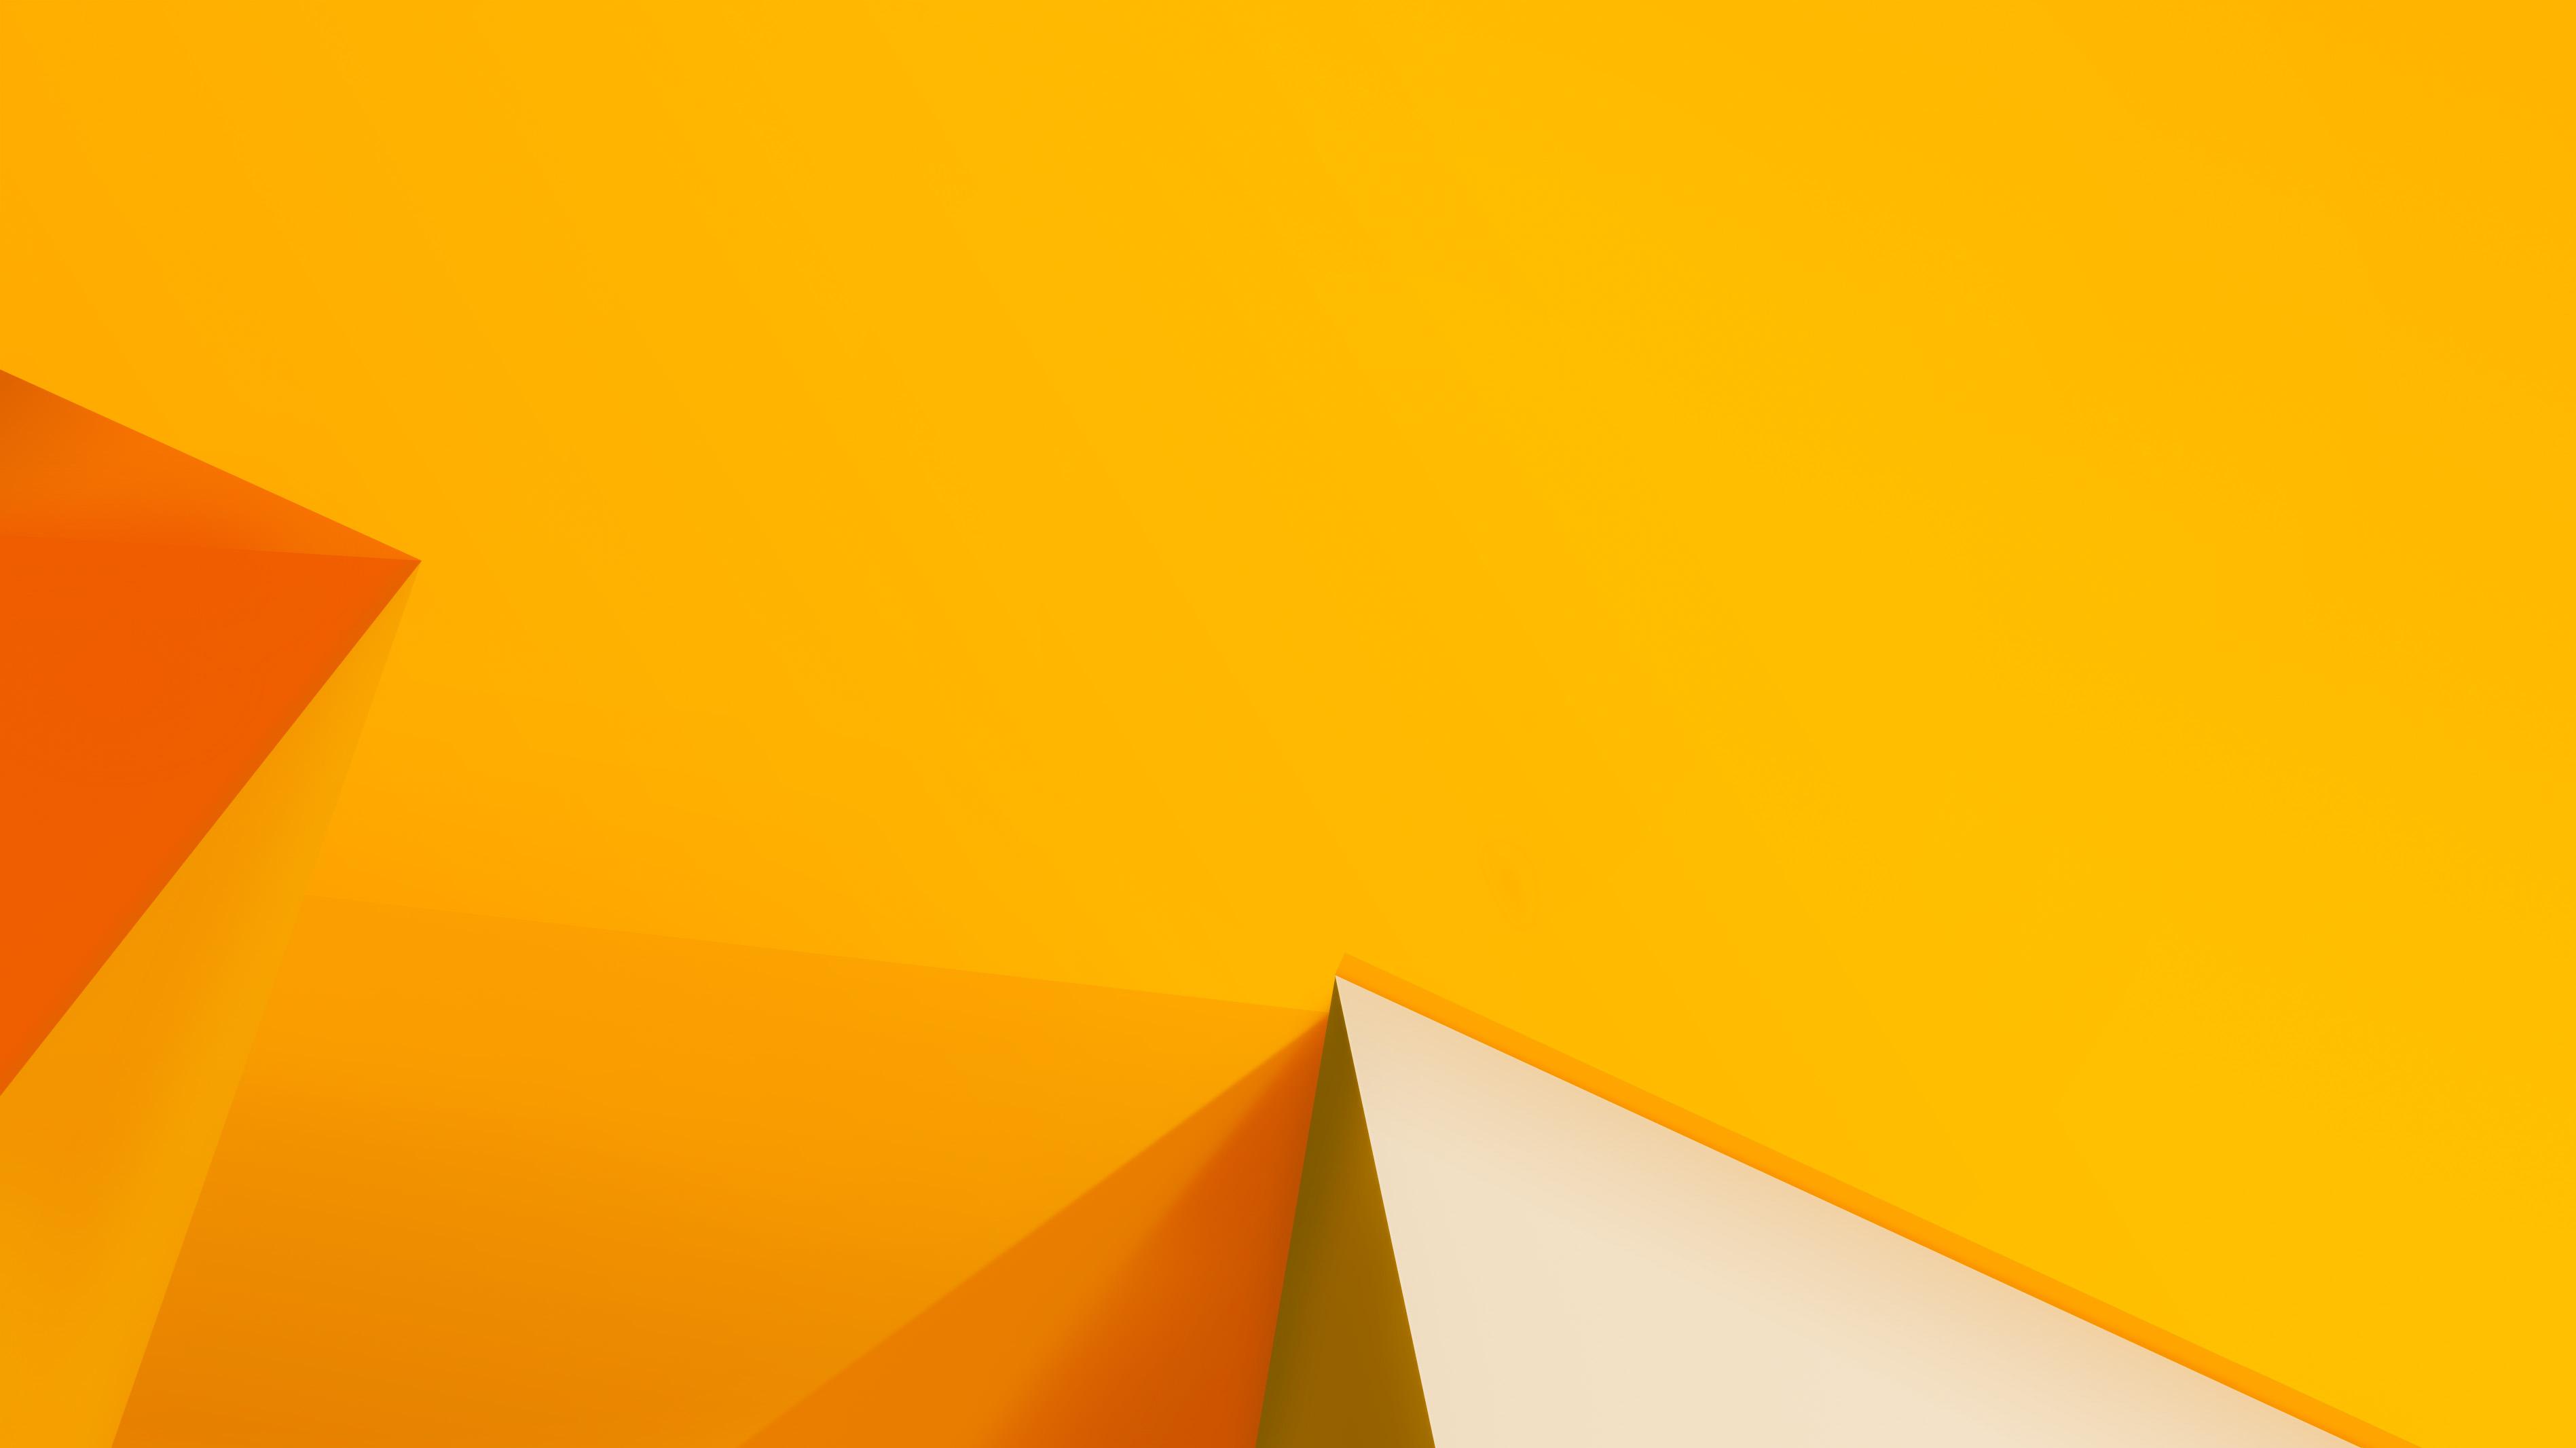 Free Download HD Wallpaper Image Desktop Official Windows 8.1